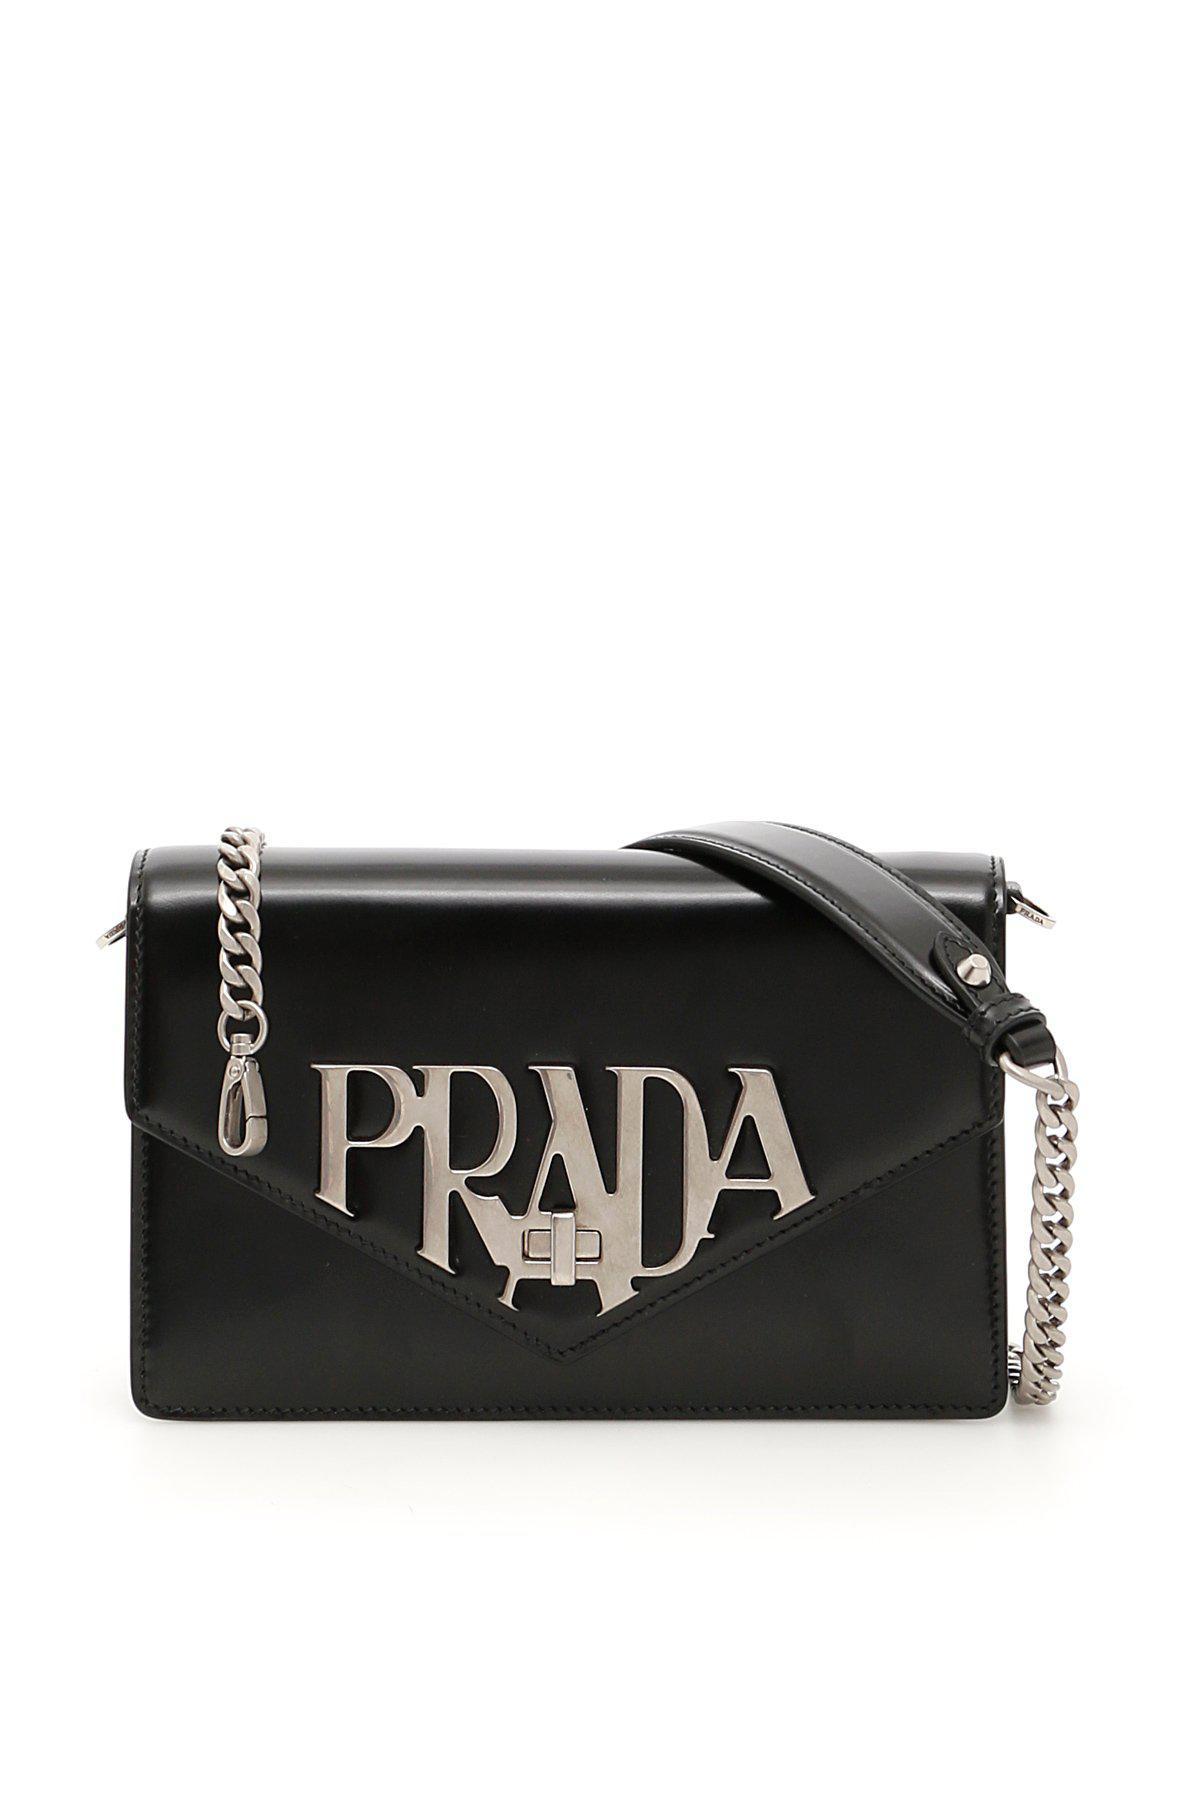 9ece7aa291e9 Prada - Black Logo Envelope Shoulder Bag - Lyst. View fullscreen